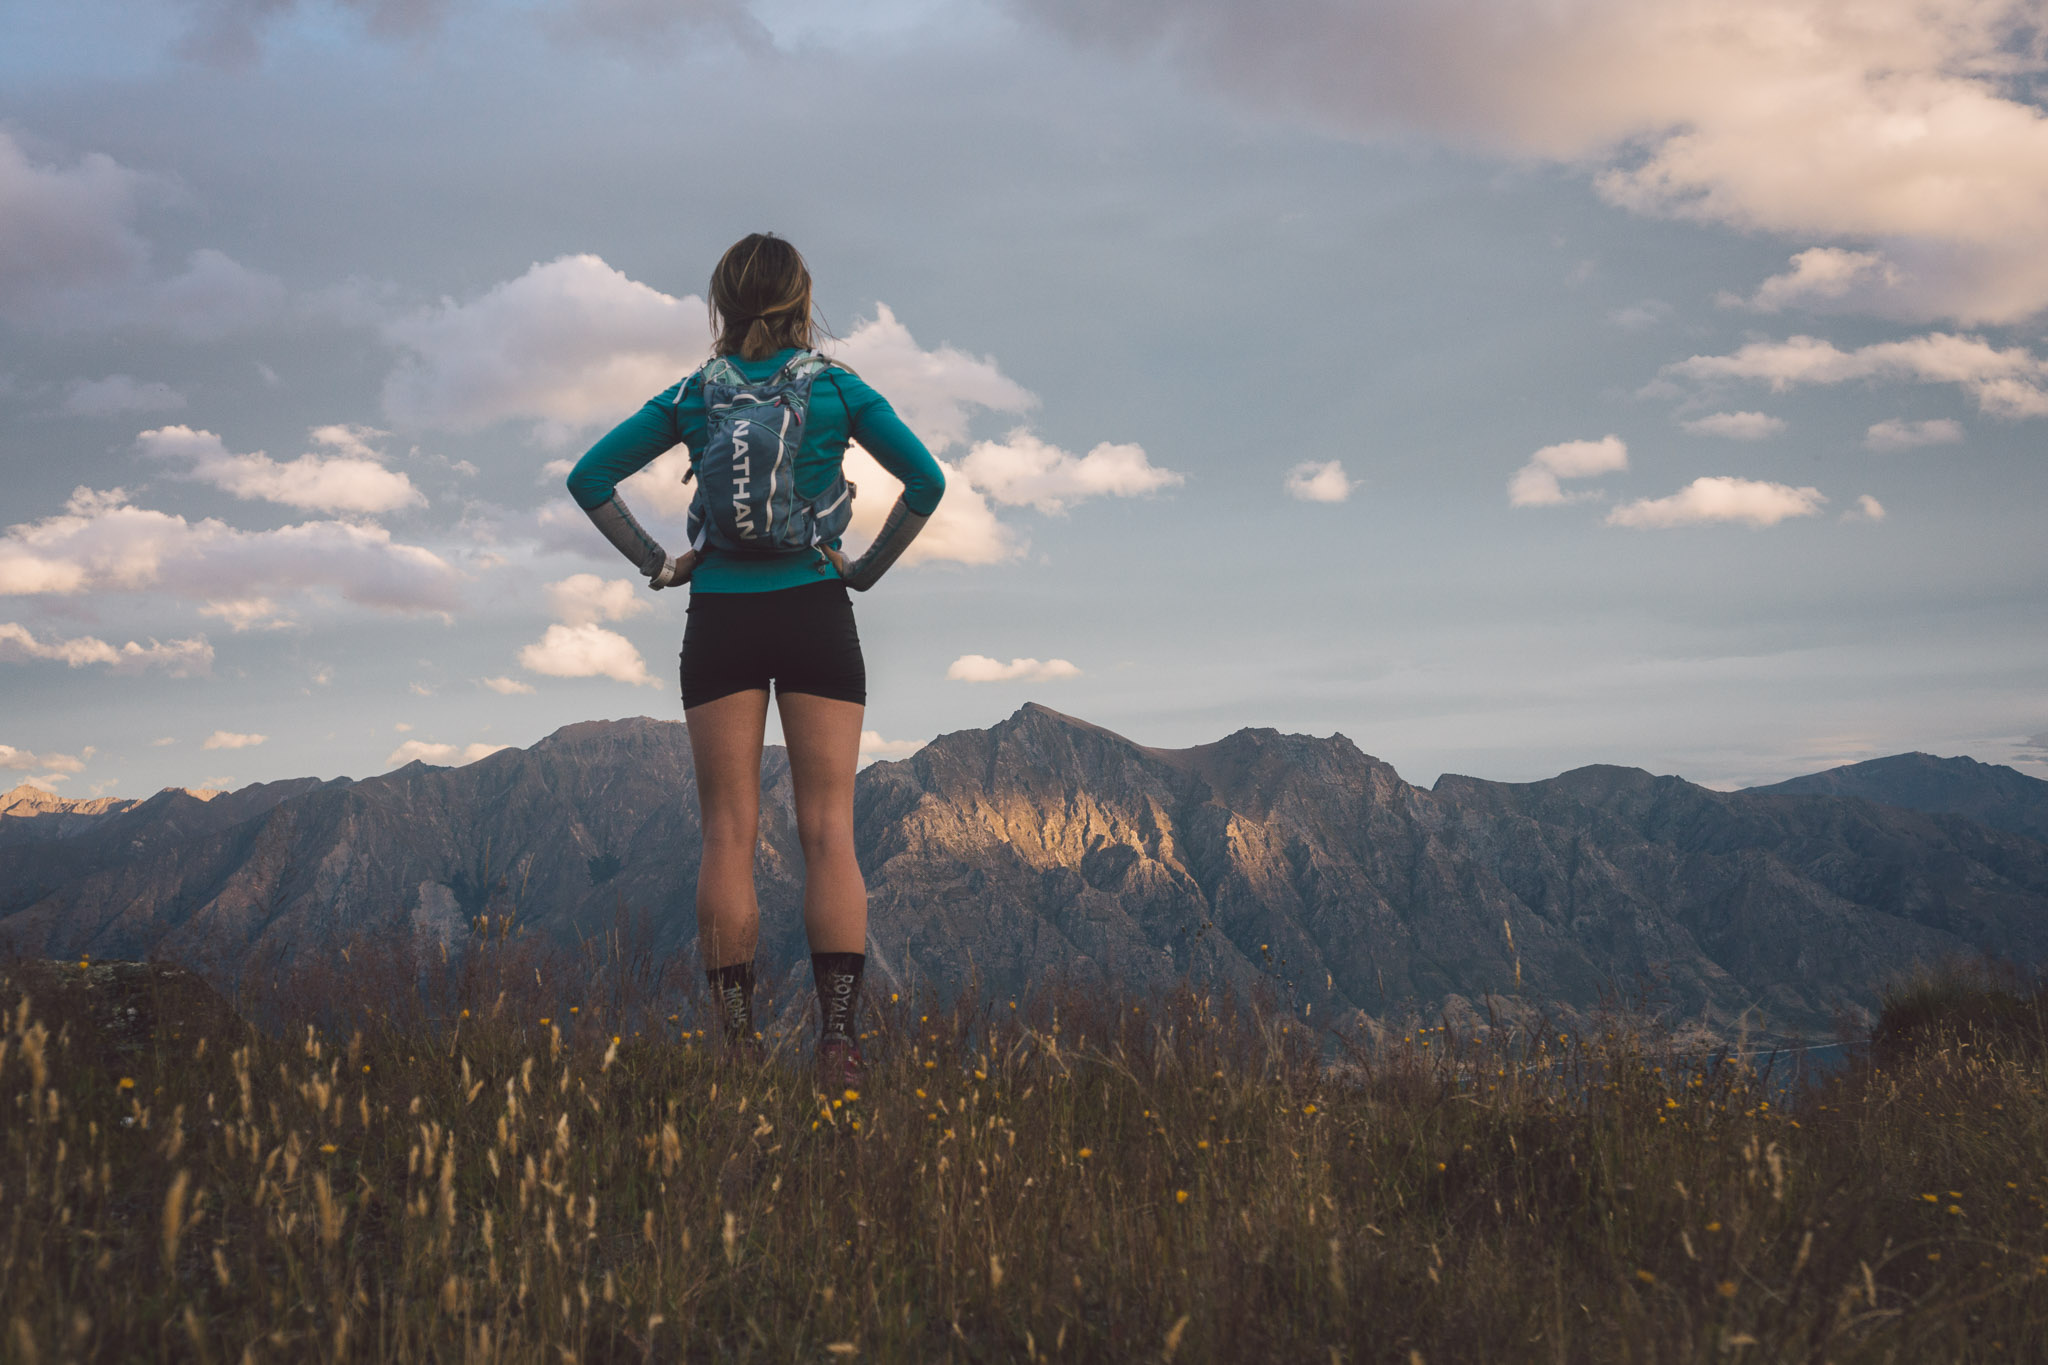 Pausing to take in the commanding beauty of Corner Peak.